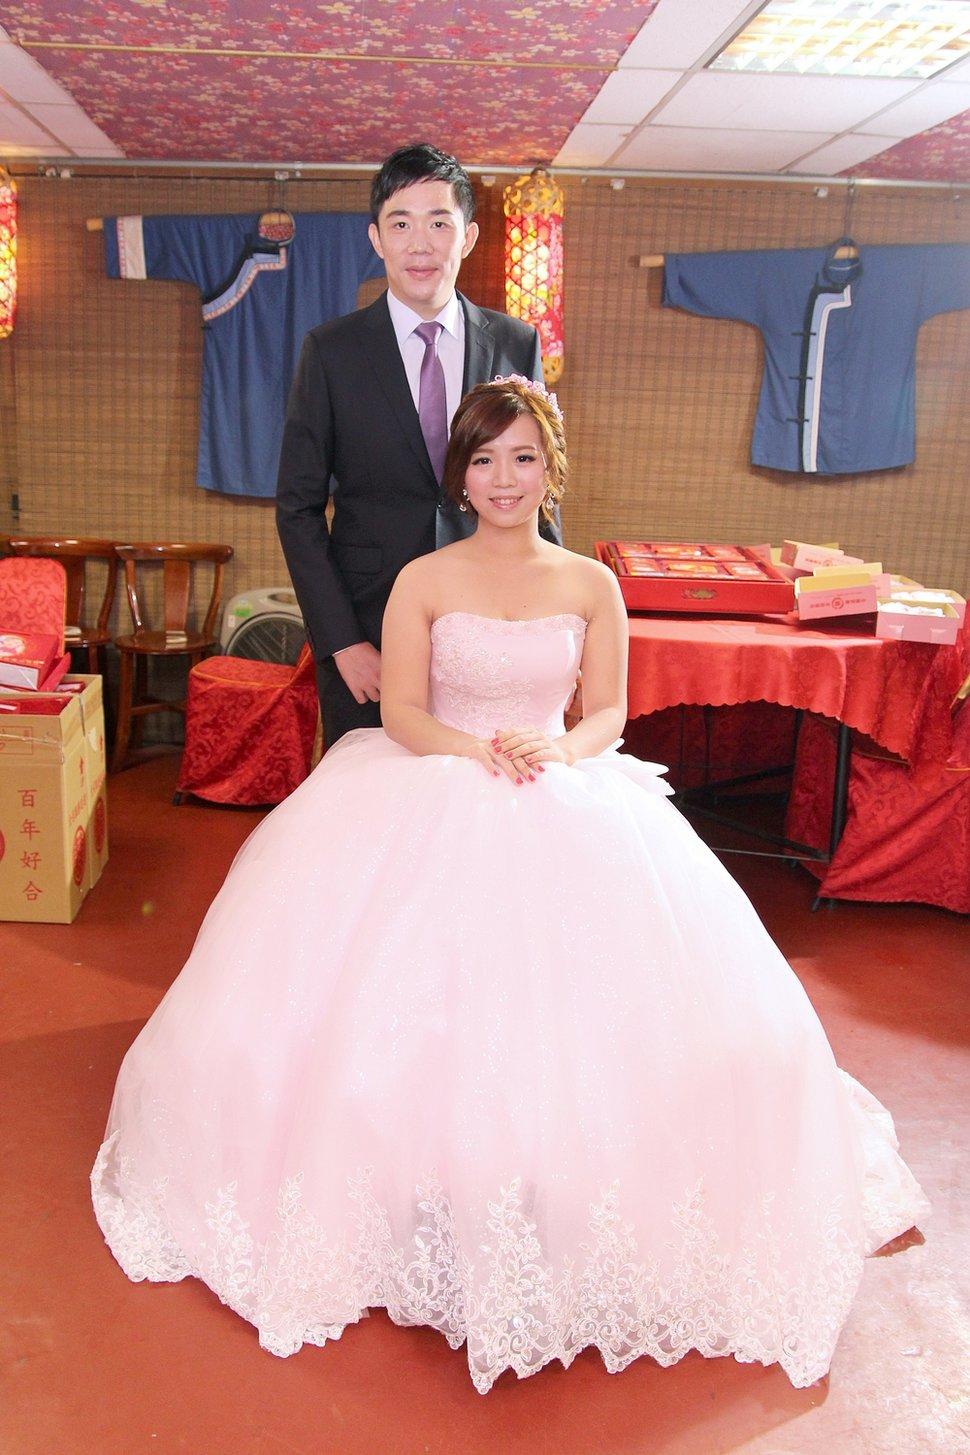 IMG_0068 - 瑞比特婚禮紀錄攝影 - 結婚吧